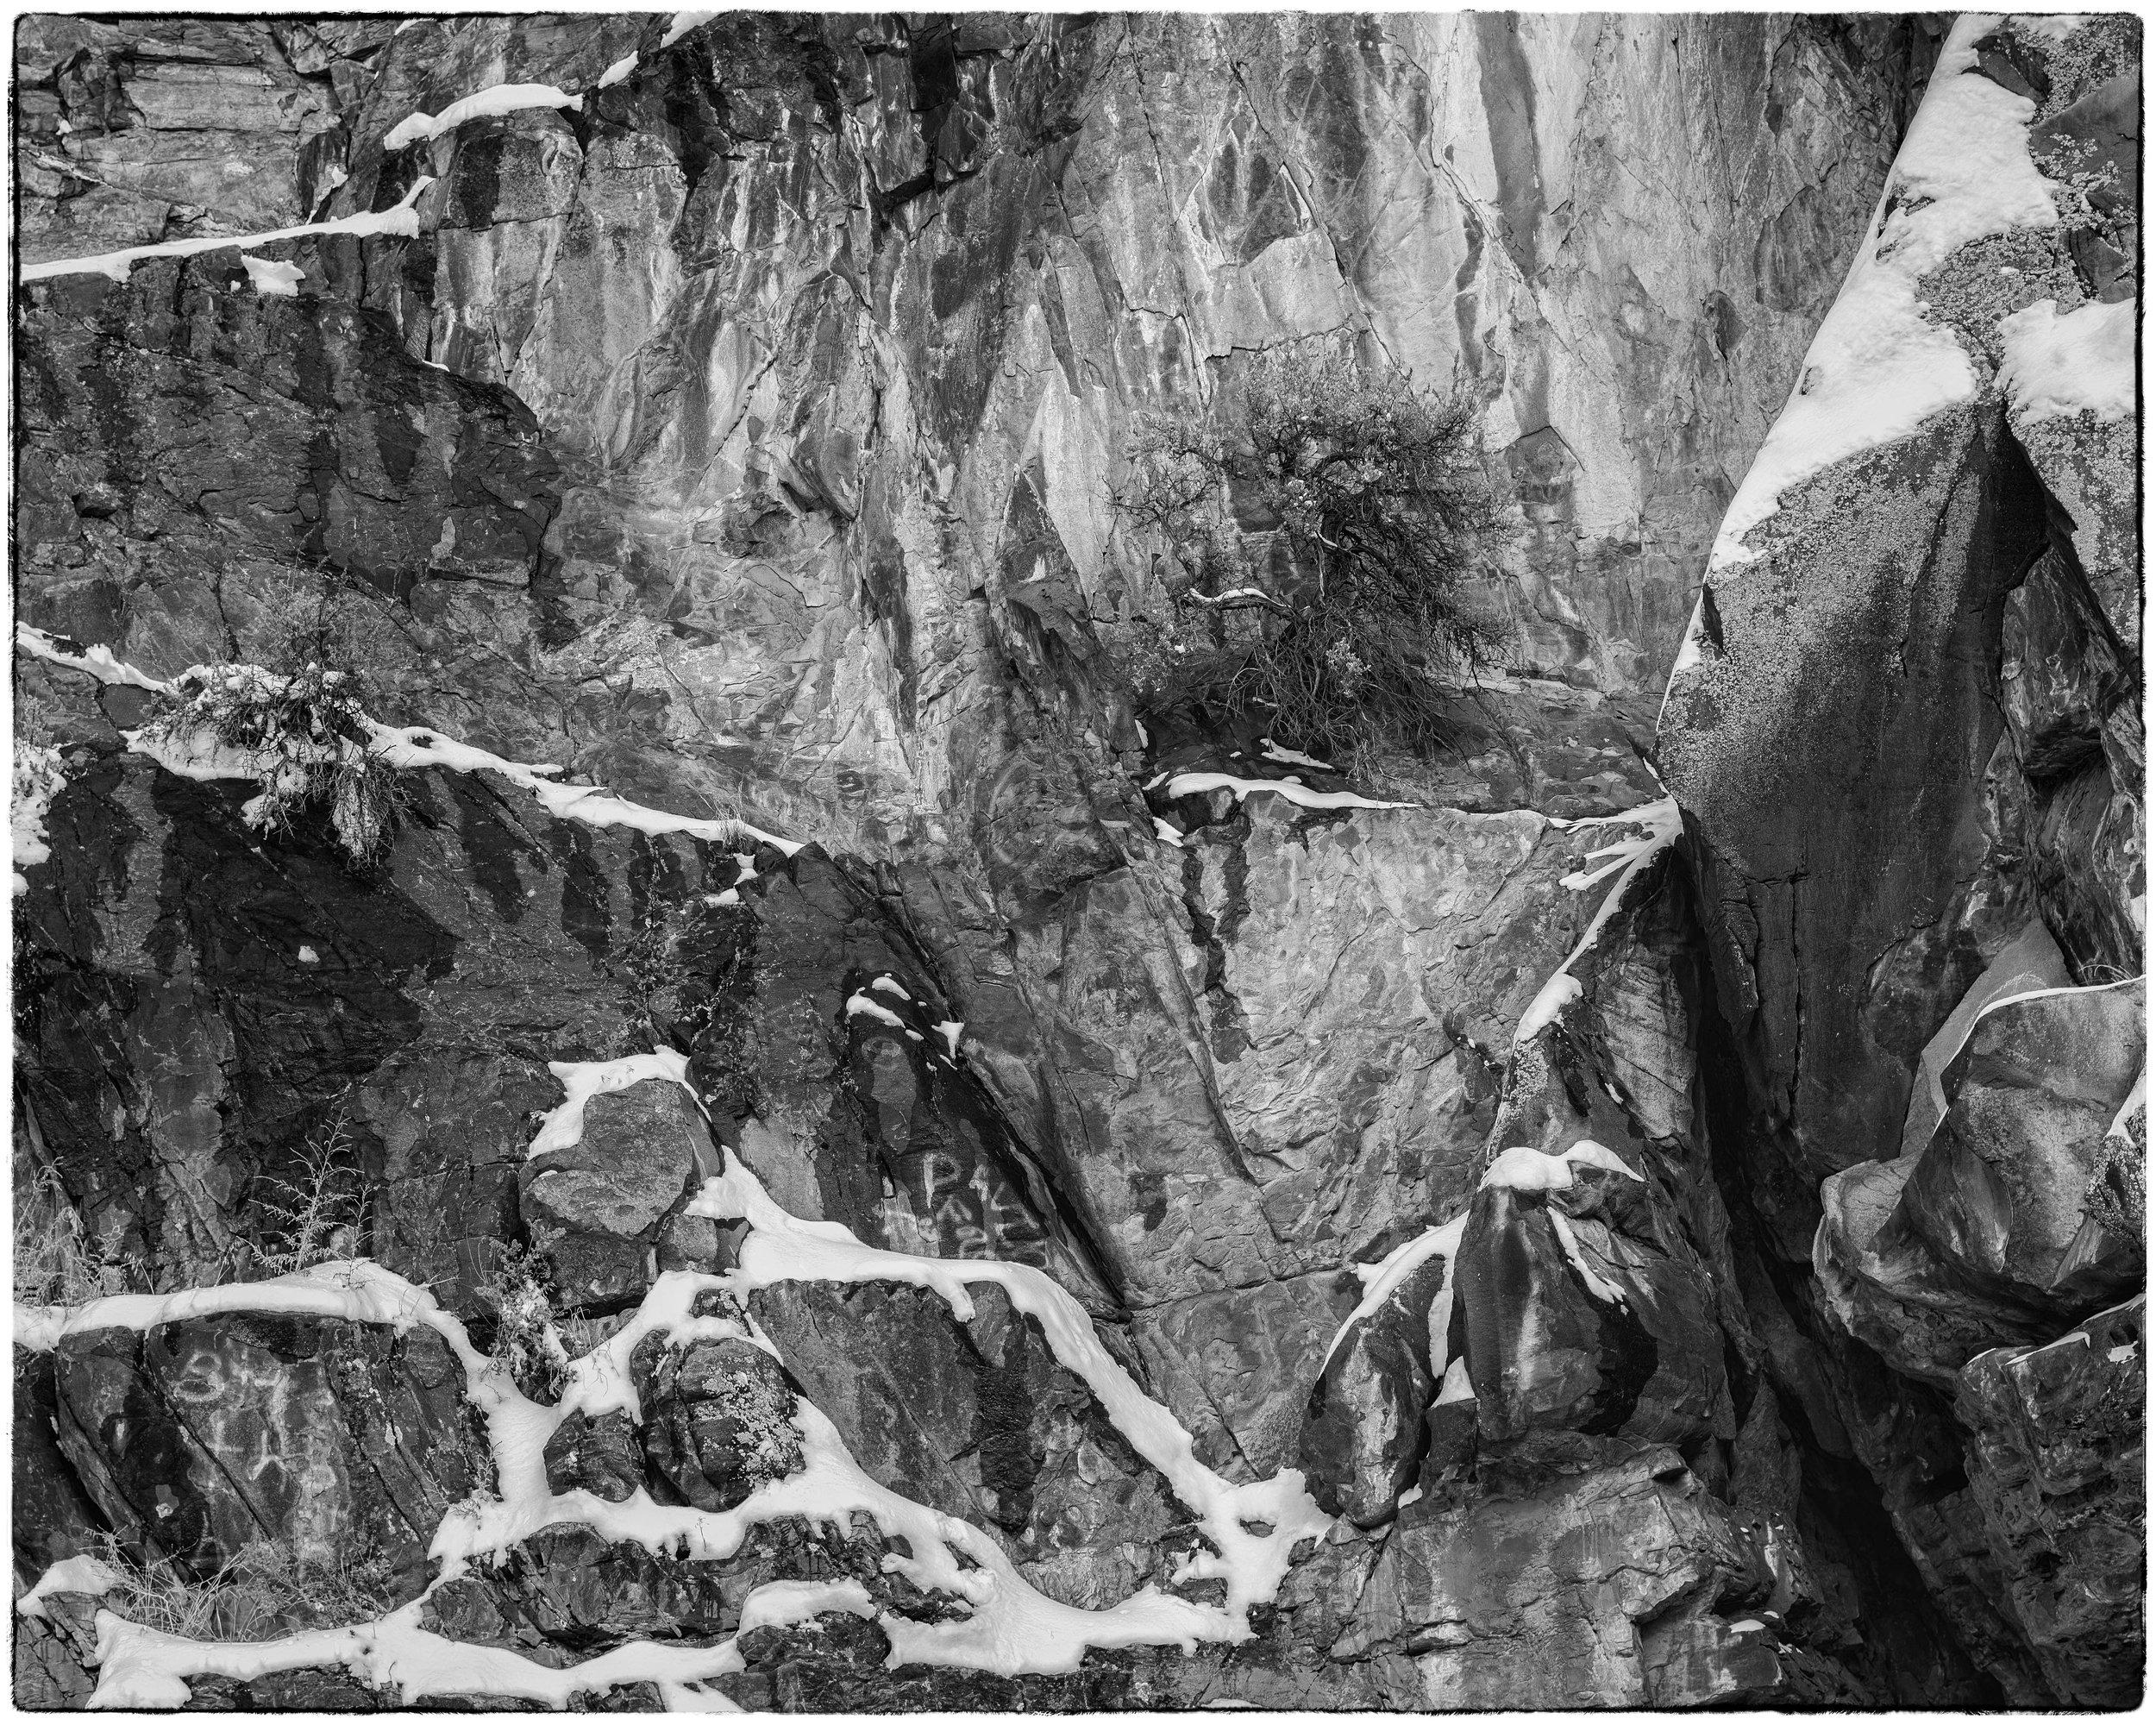 Sage on Cliff Face, Rattlesnake Bluff